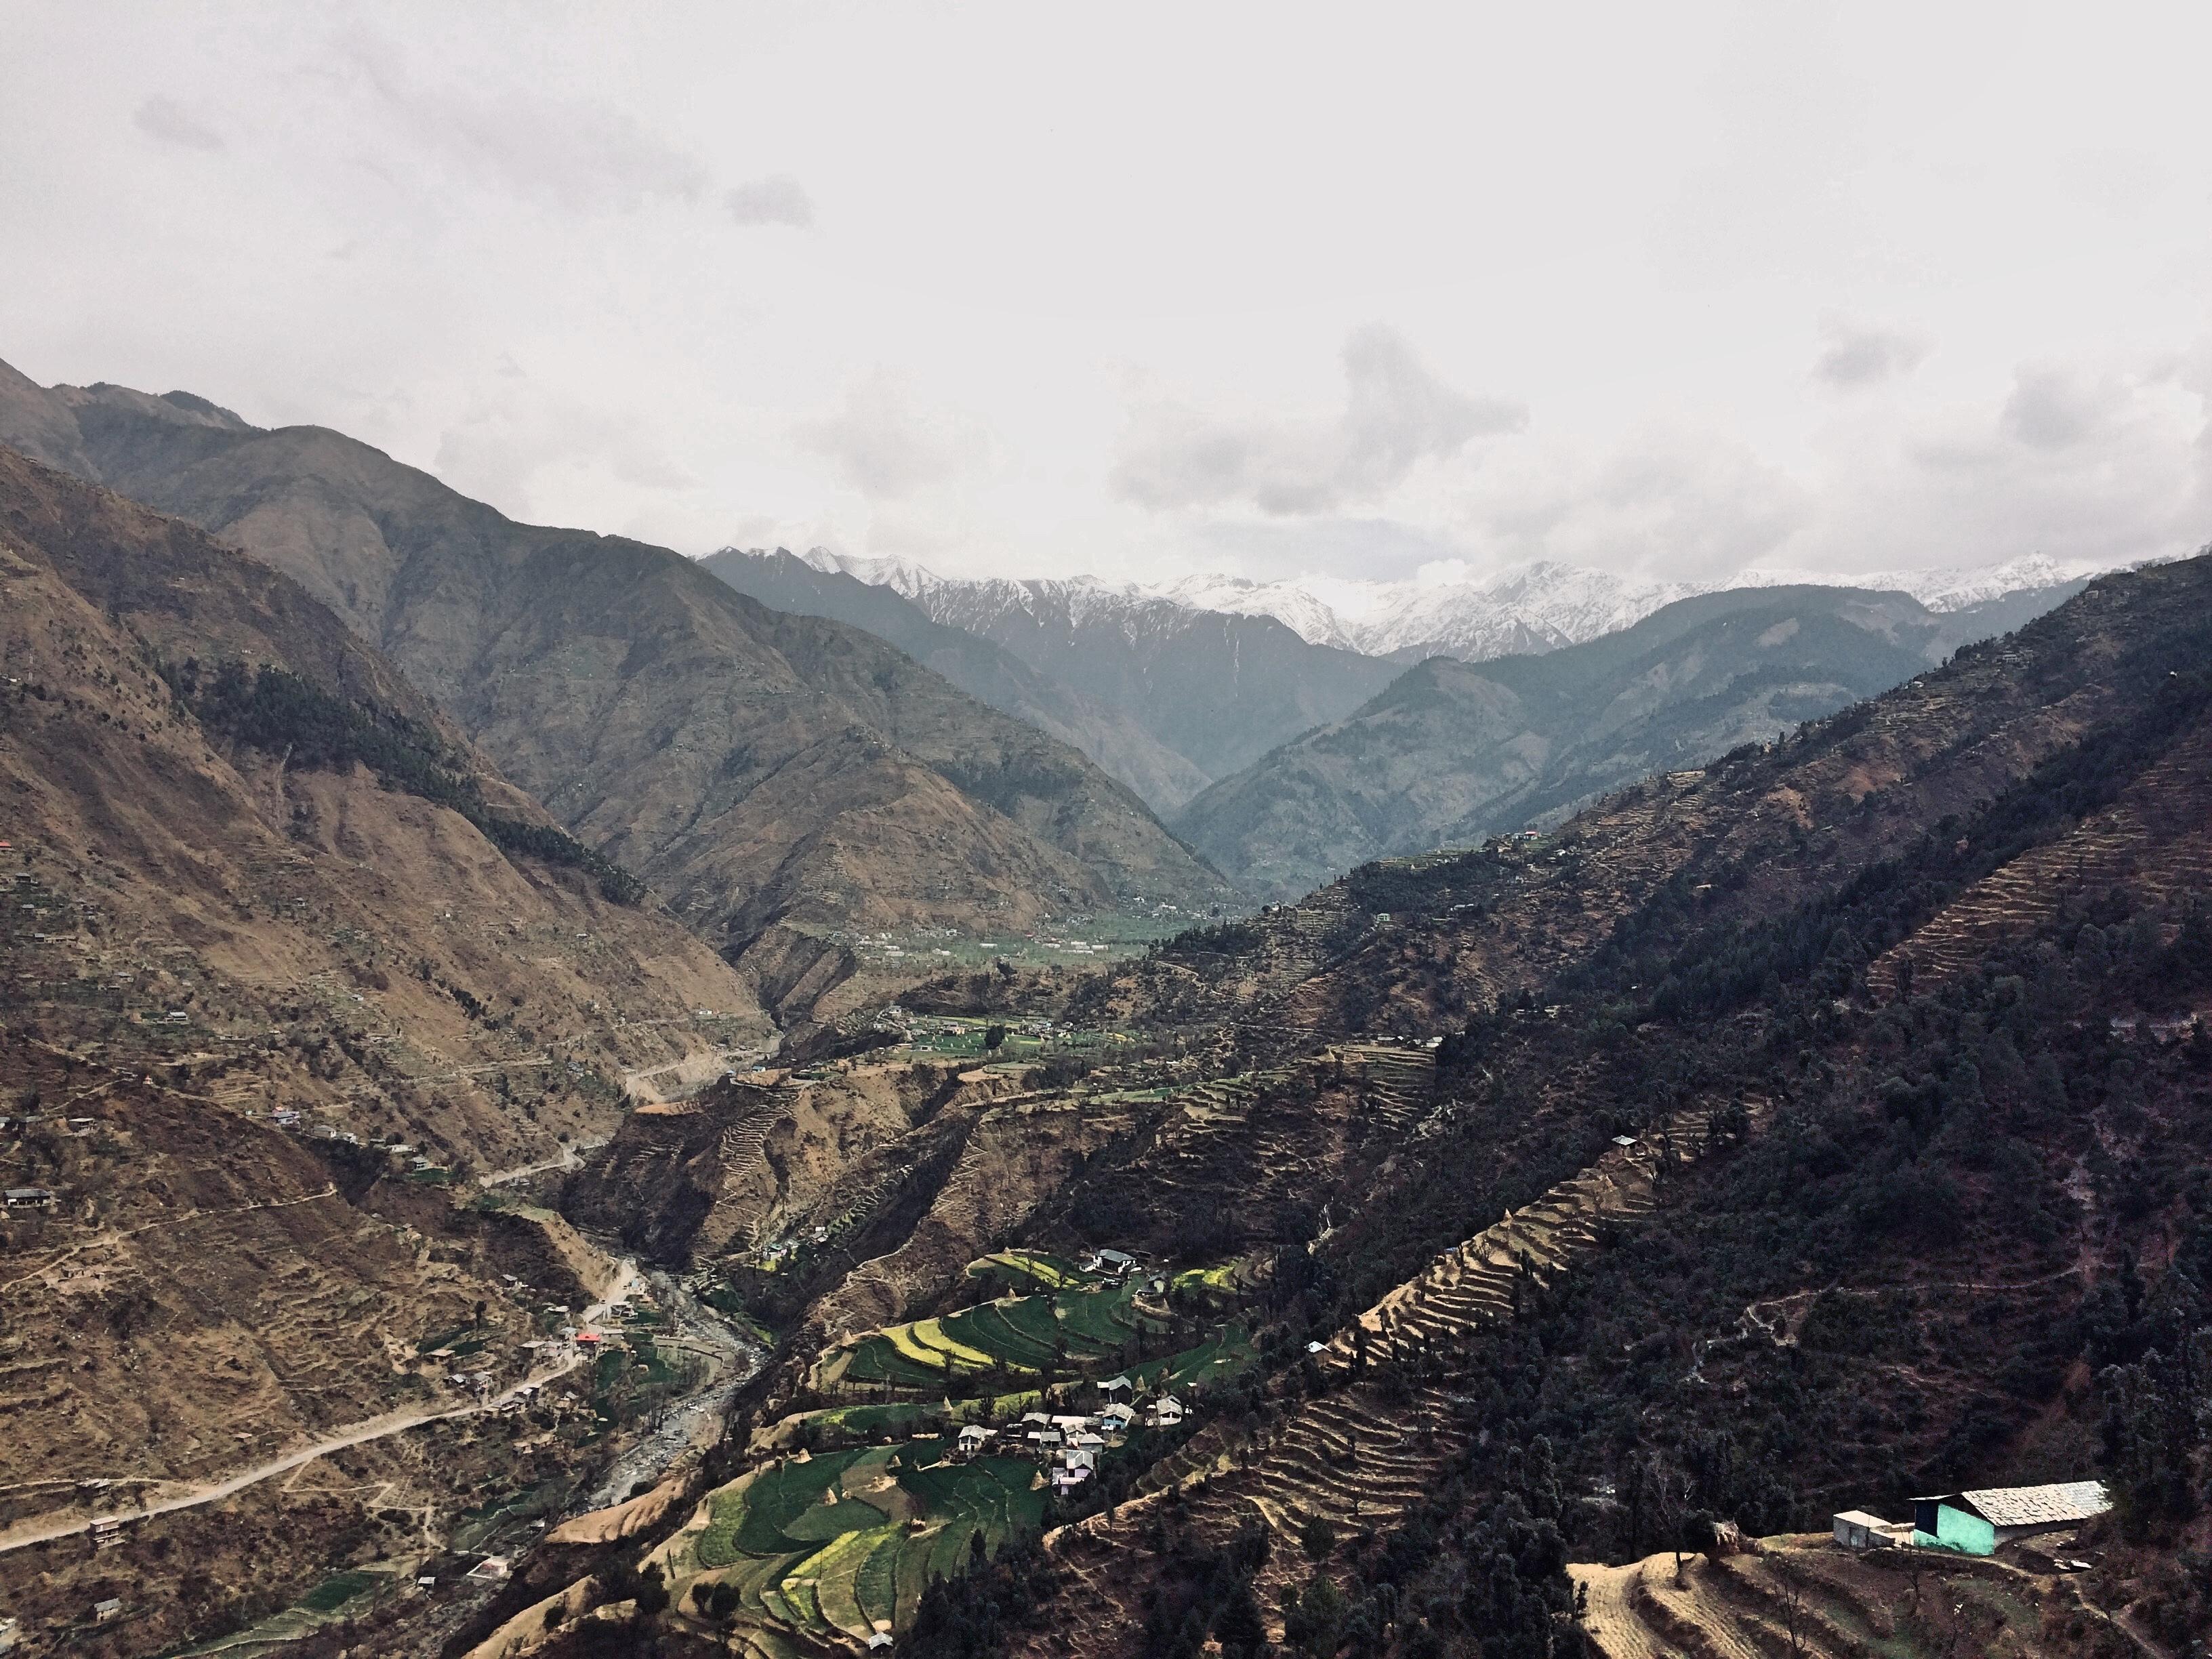 Vue de l'Himalaya depuis Chamba